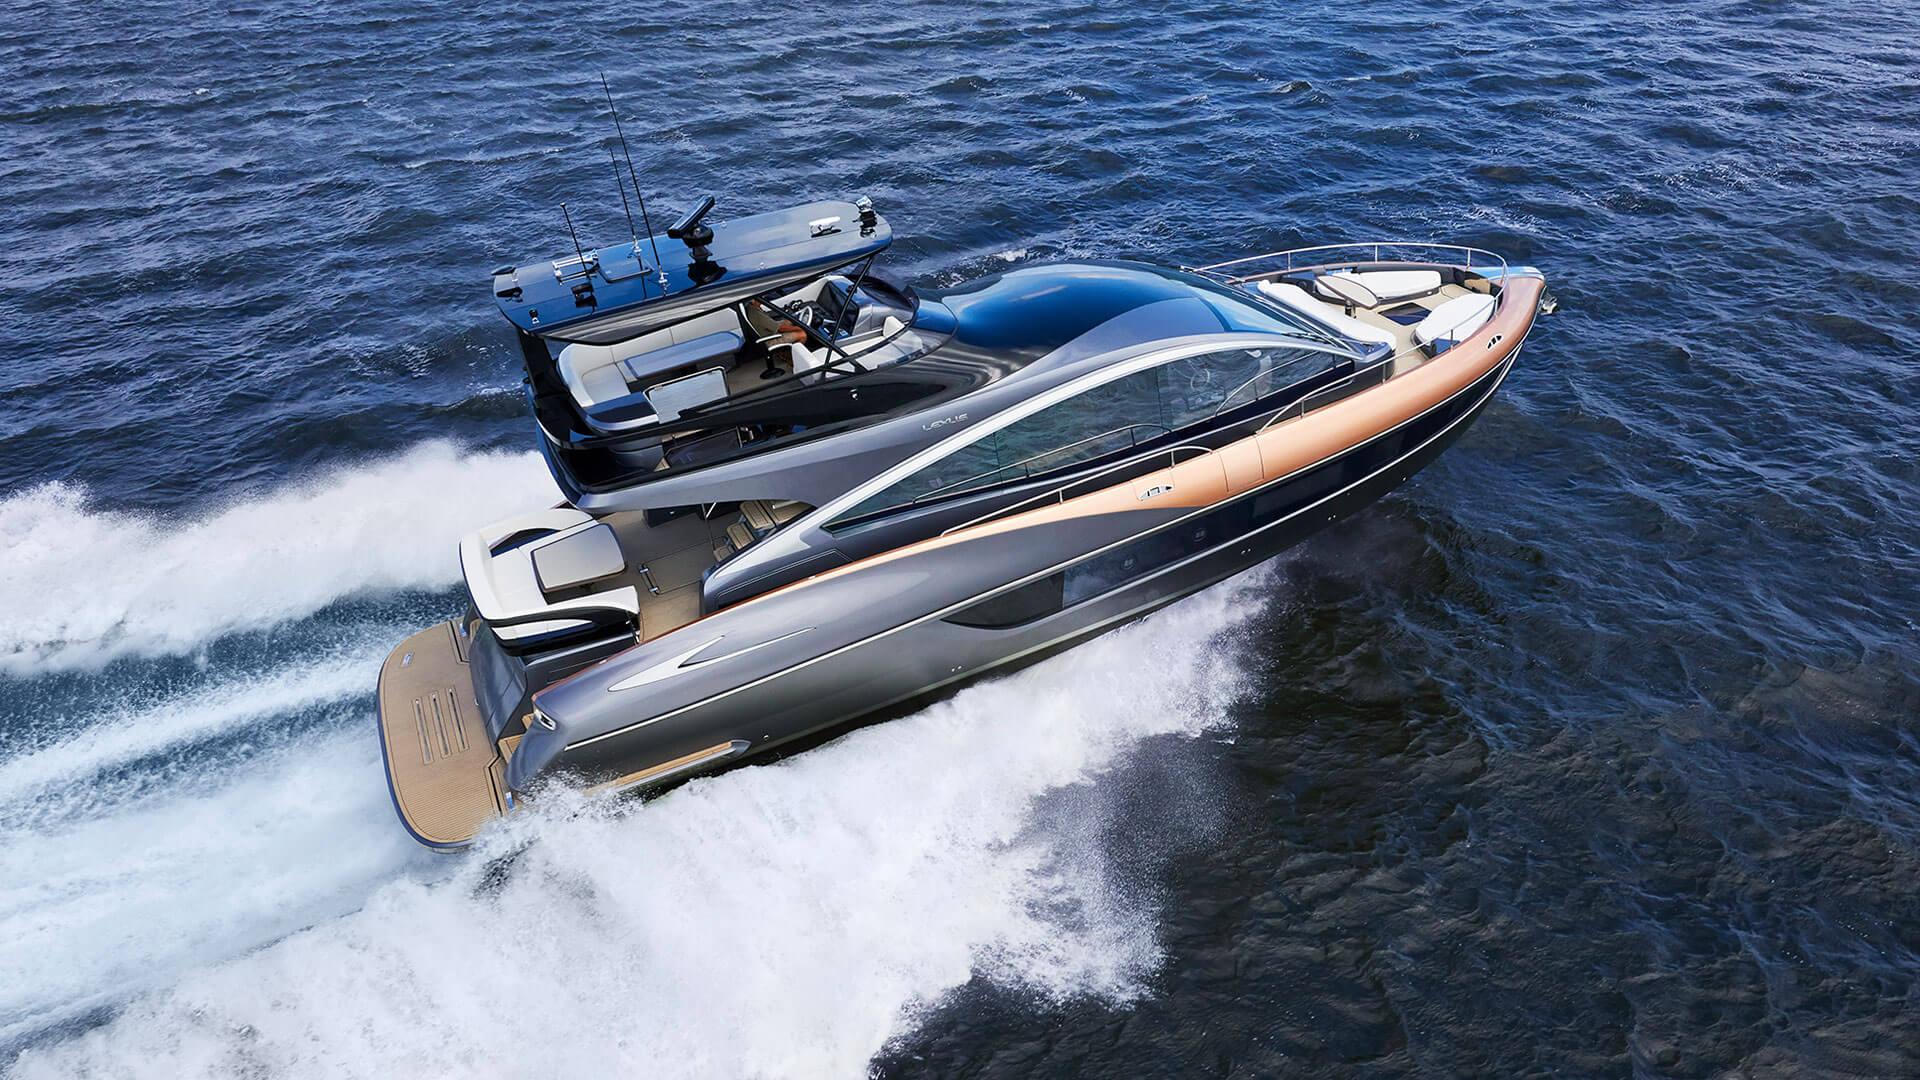 2020 lexus yacht ly 650 premiere hero